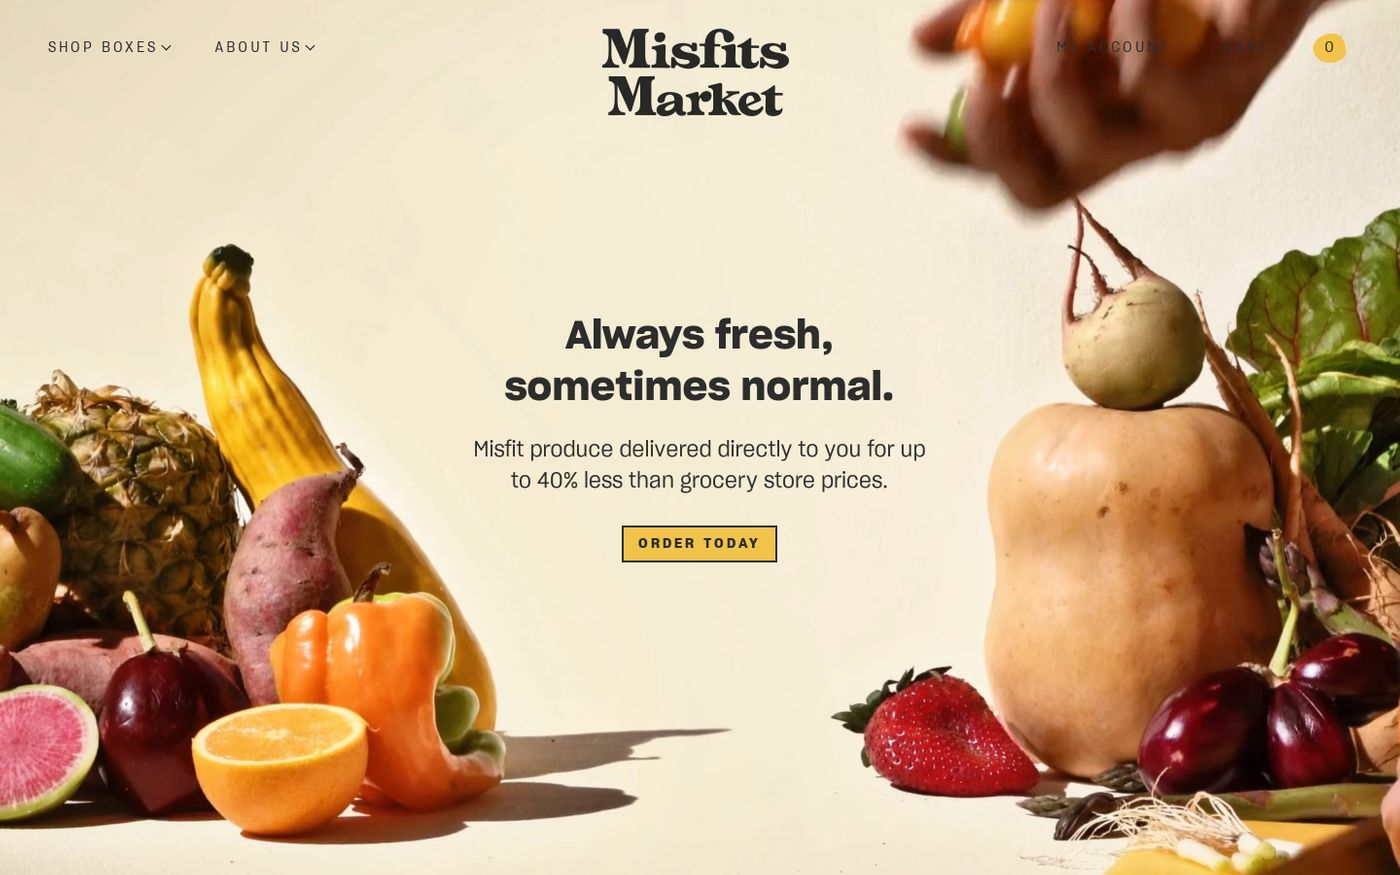 Screenshot of Misfits Market website